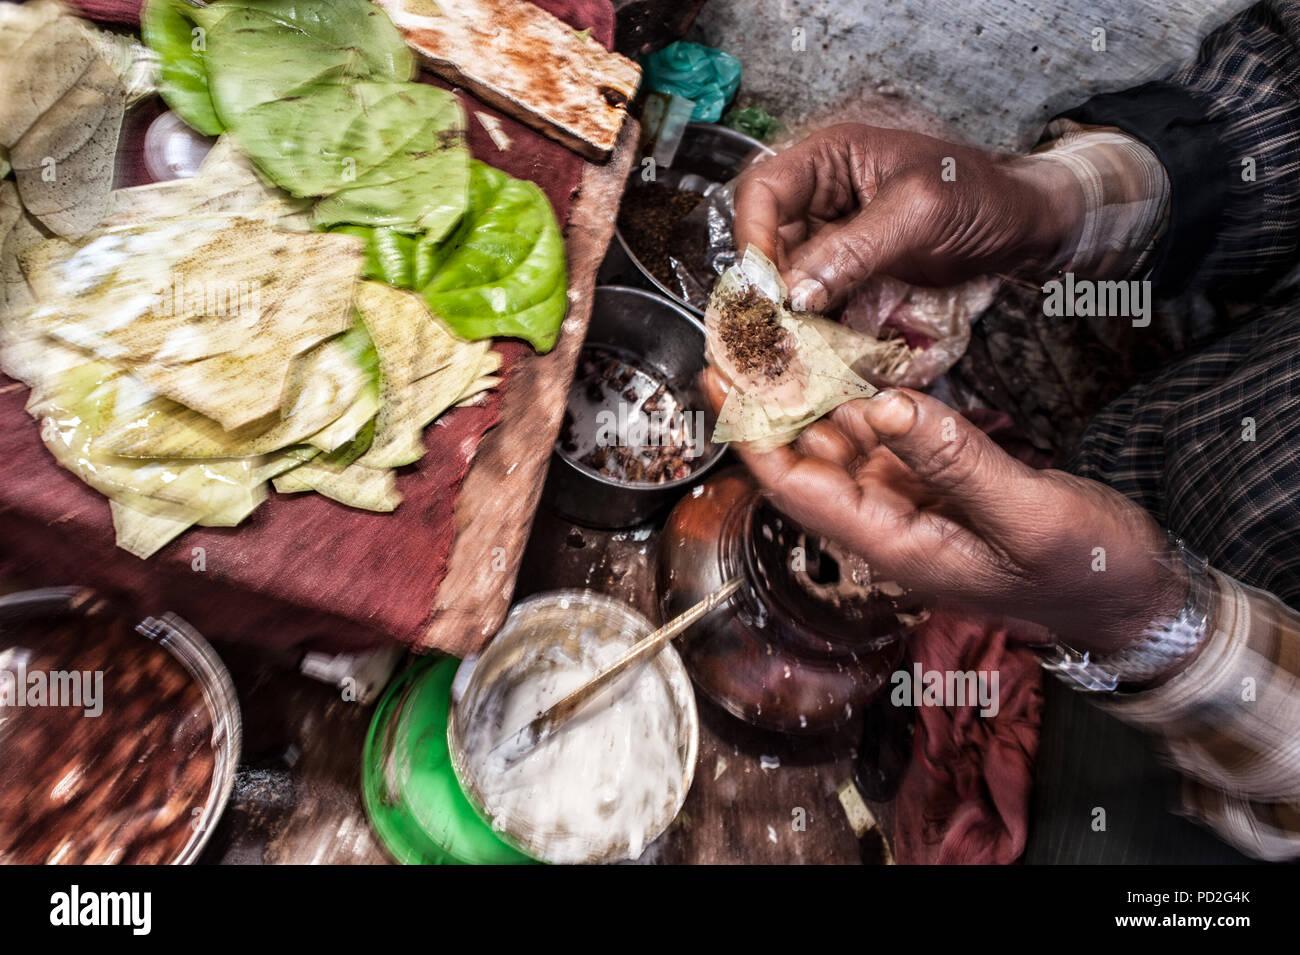 Betel leafs street shop, Old town, Varanasi, Uttar Pradesh, India - Stock Image